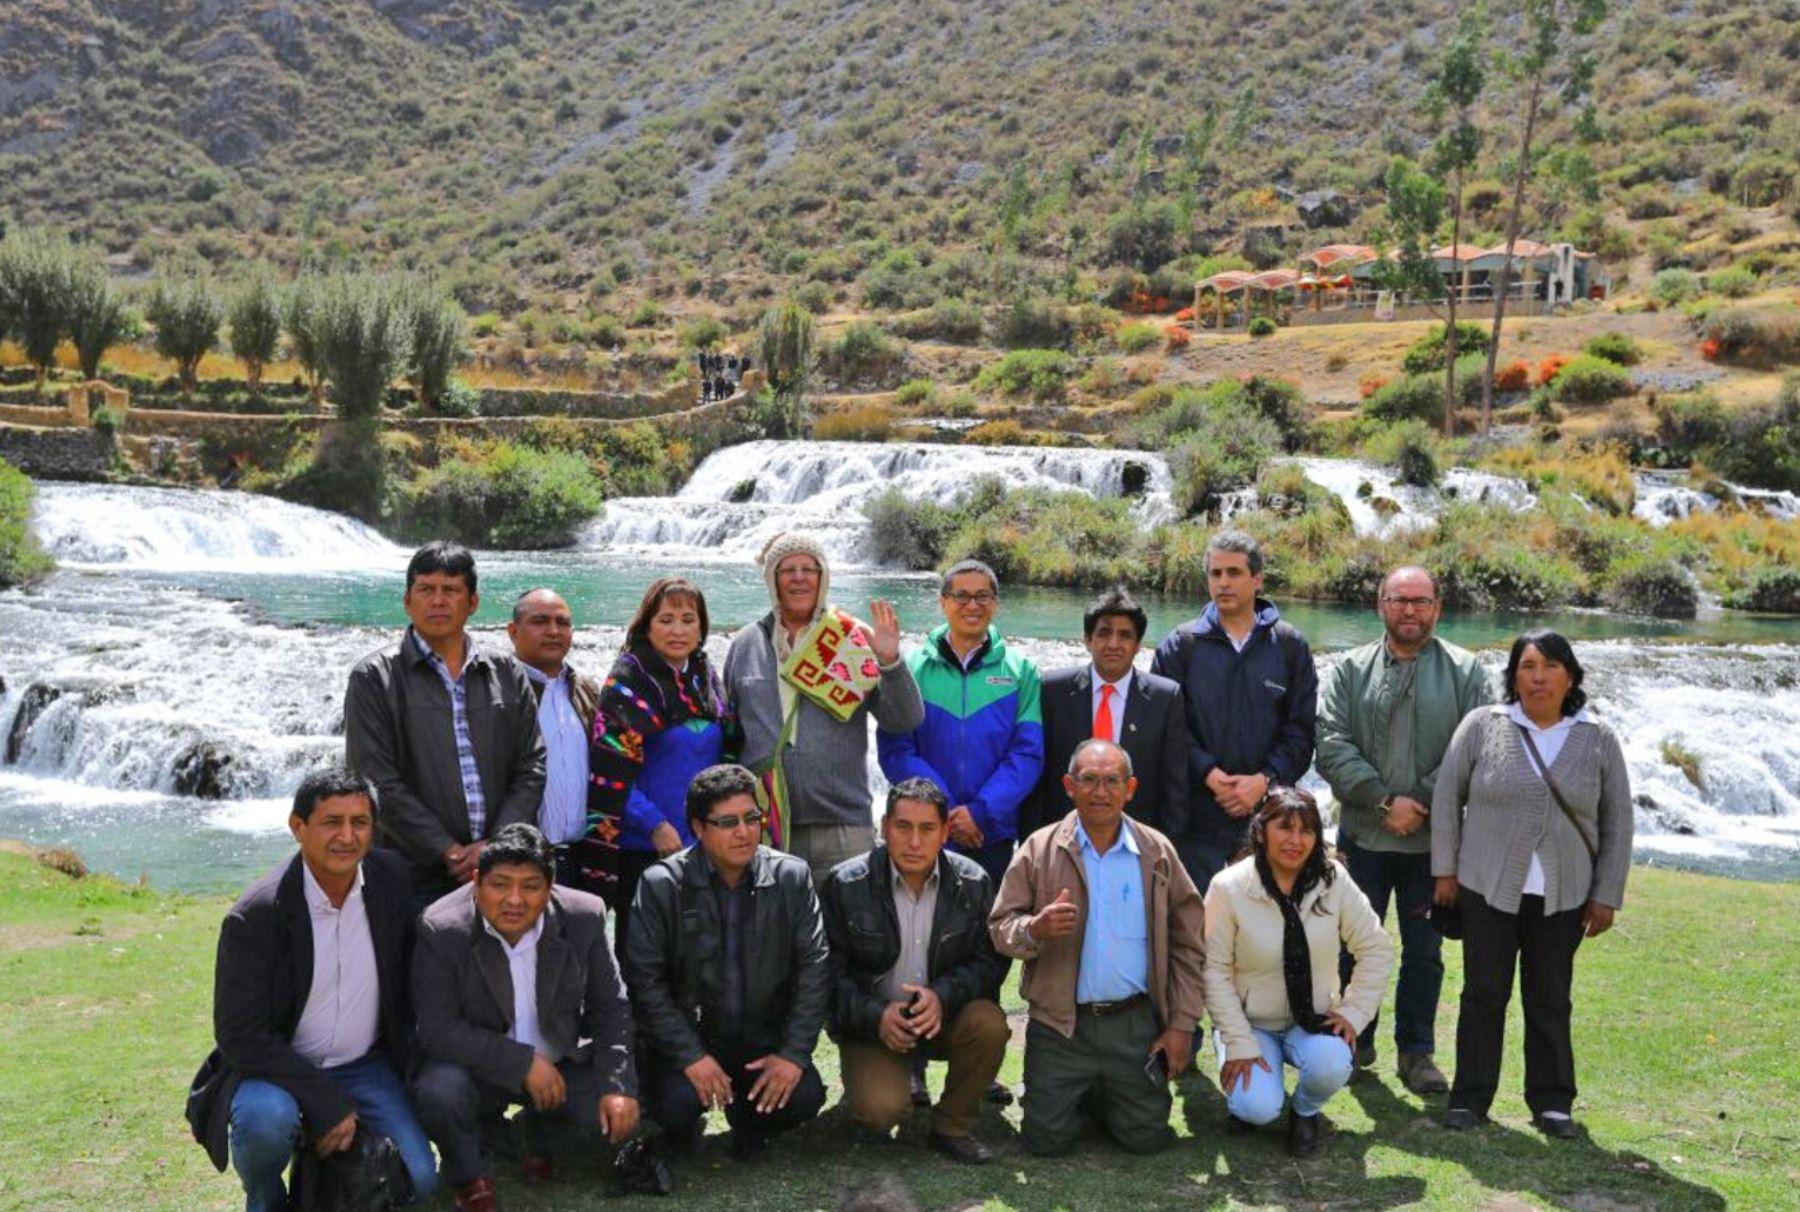 Presidente Pedro Pablo Kuczynski lanzó iniciativa que busca la conservación del agua.Foto:  ANDINA/Prensa Presidencia.